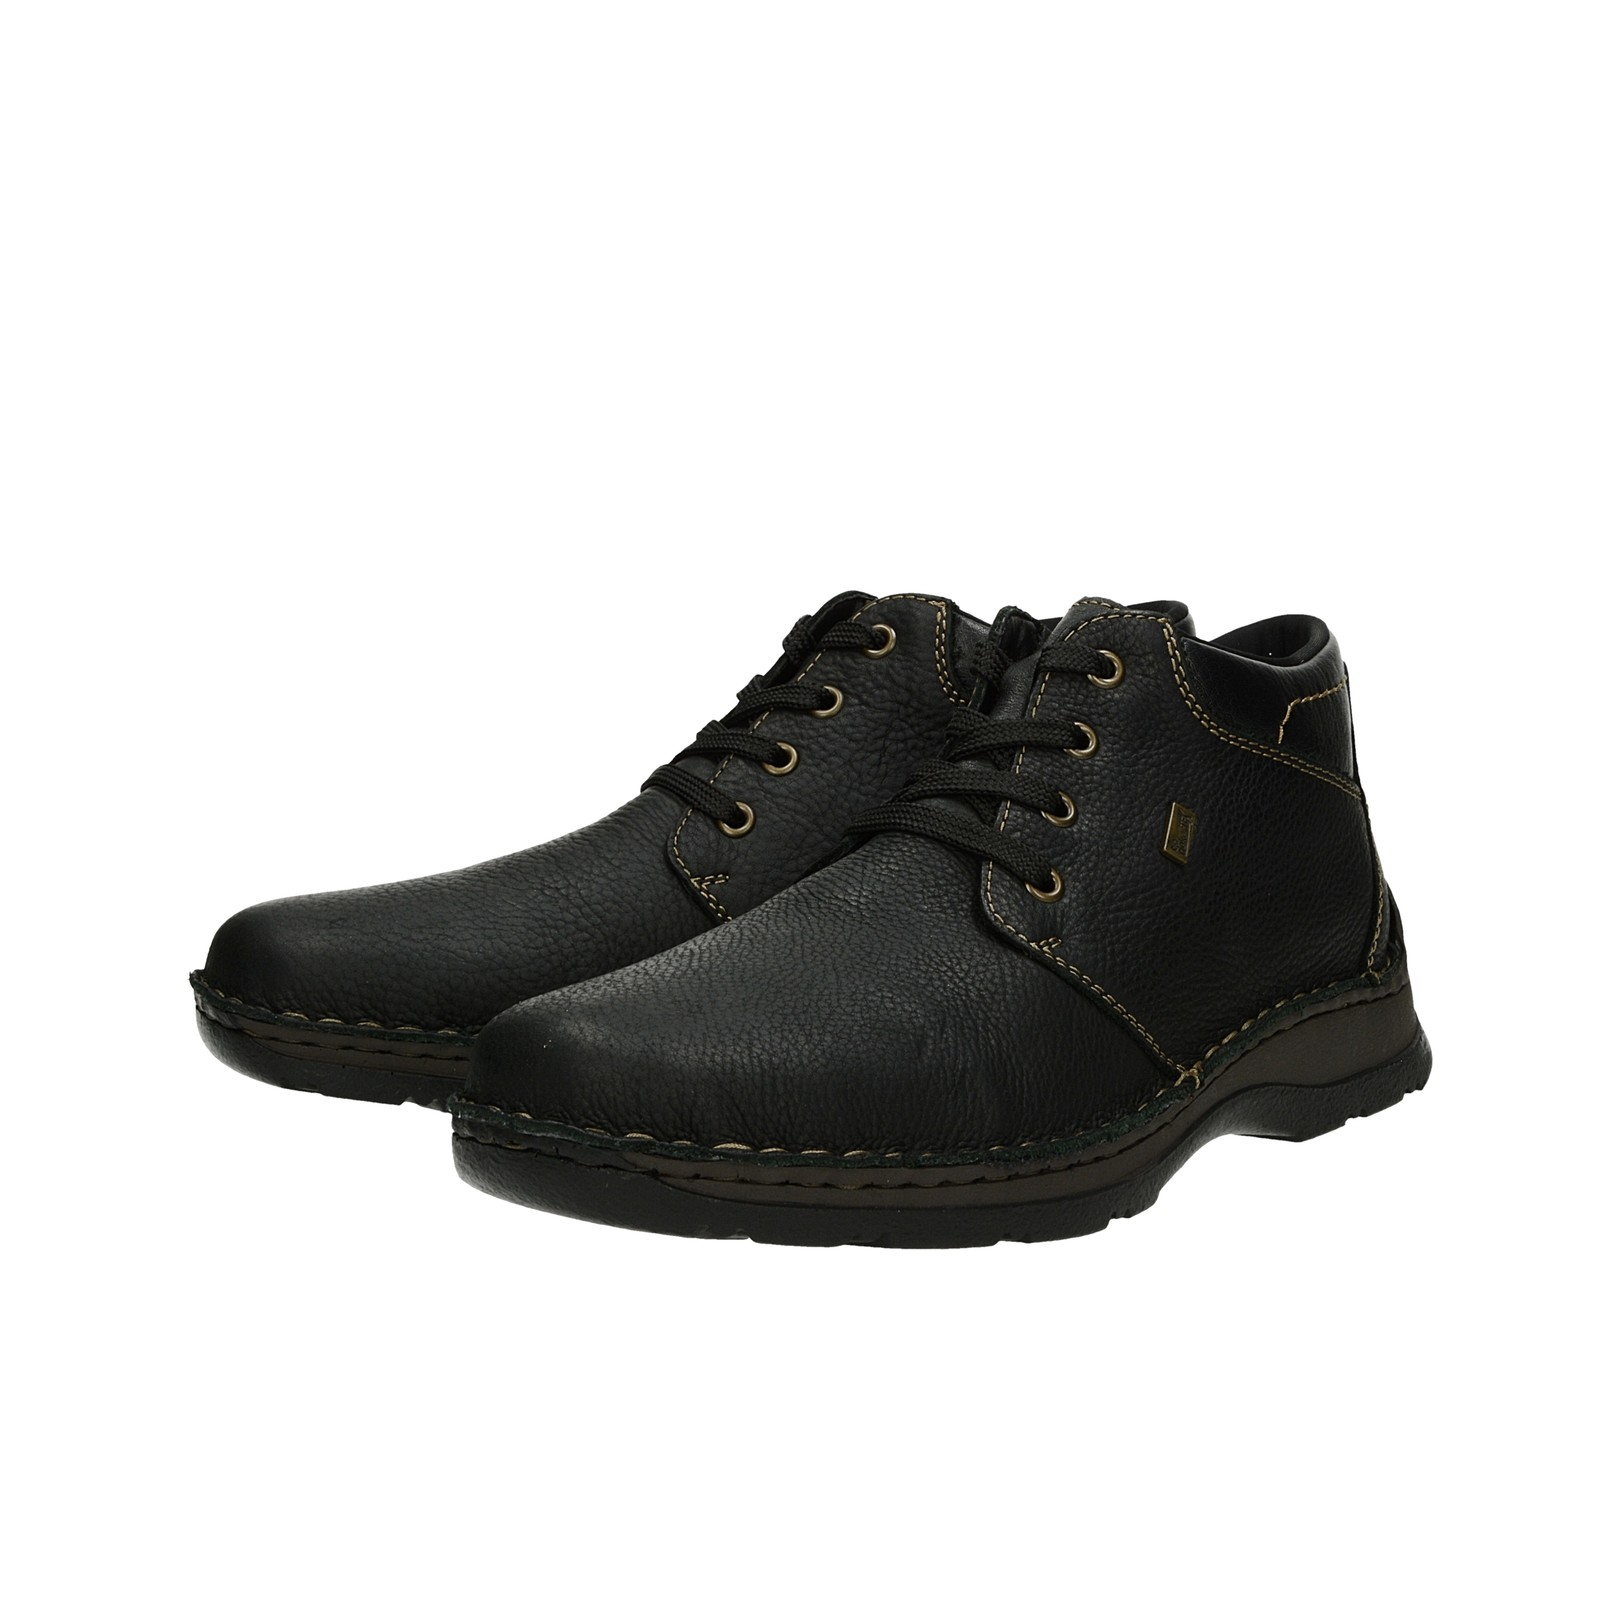 443dfd268 Rieker pánske zimné topánky - čierne | 530500-BLK www.robel.sk